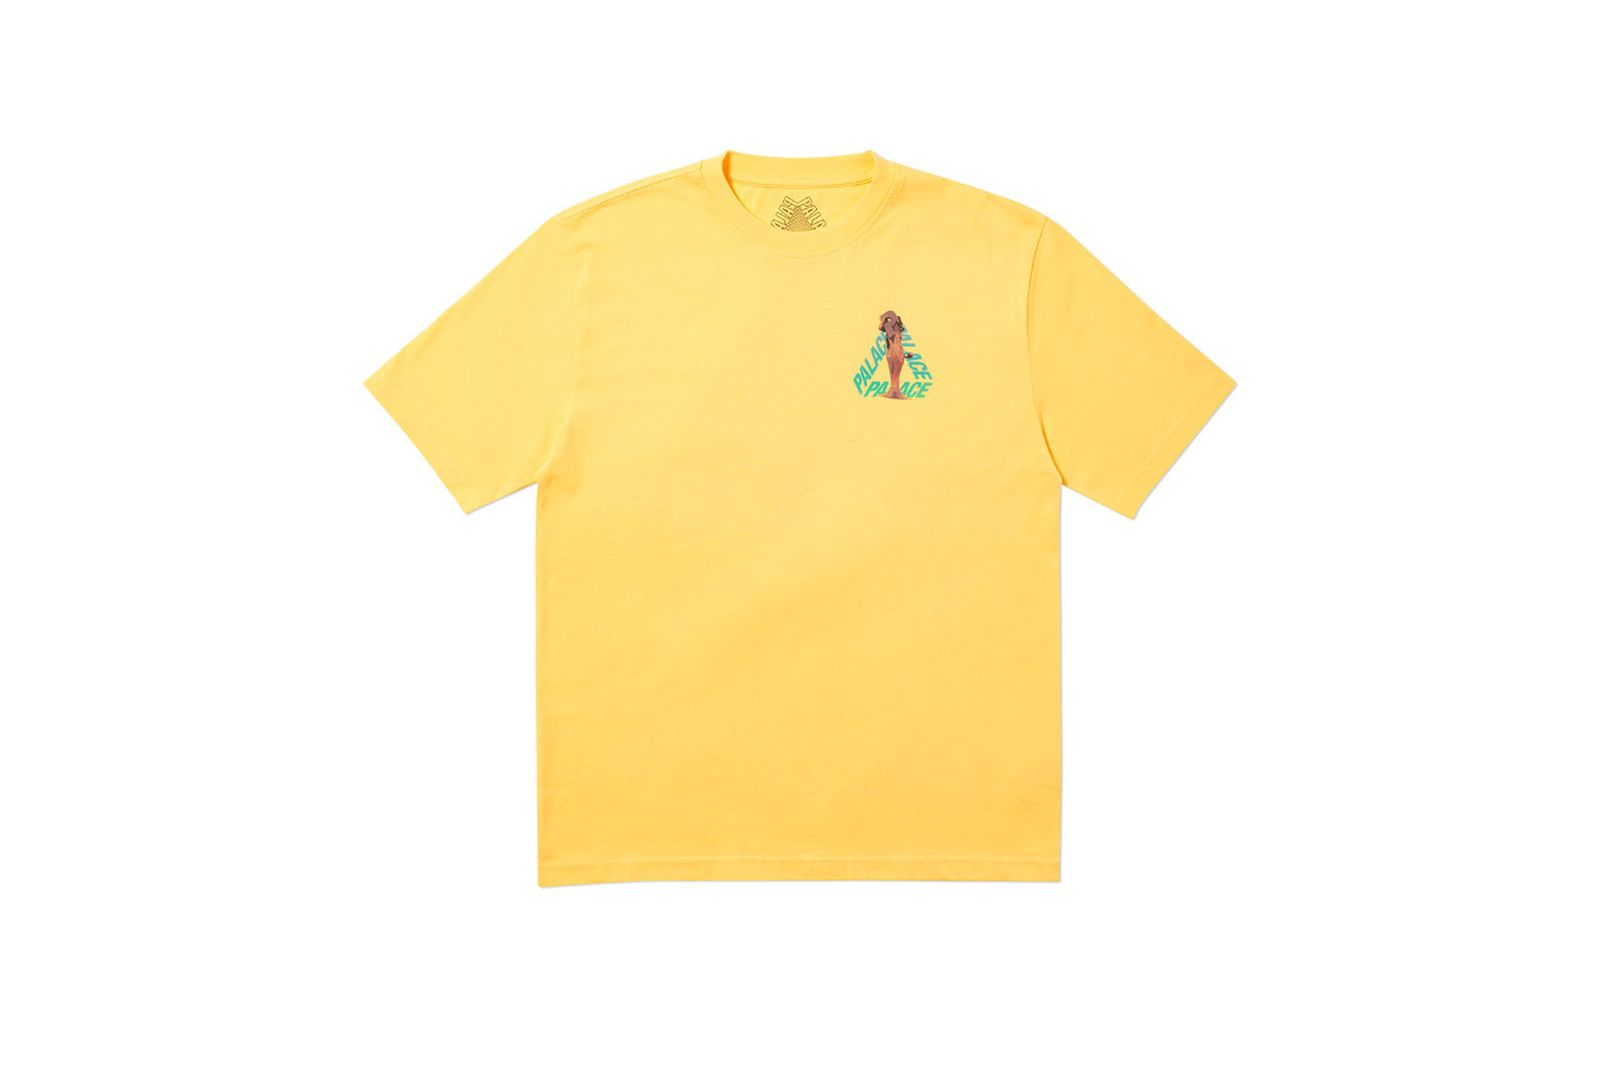 Palace 2019 Autumn T Shirt Rolls P3 yellow front